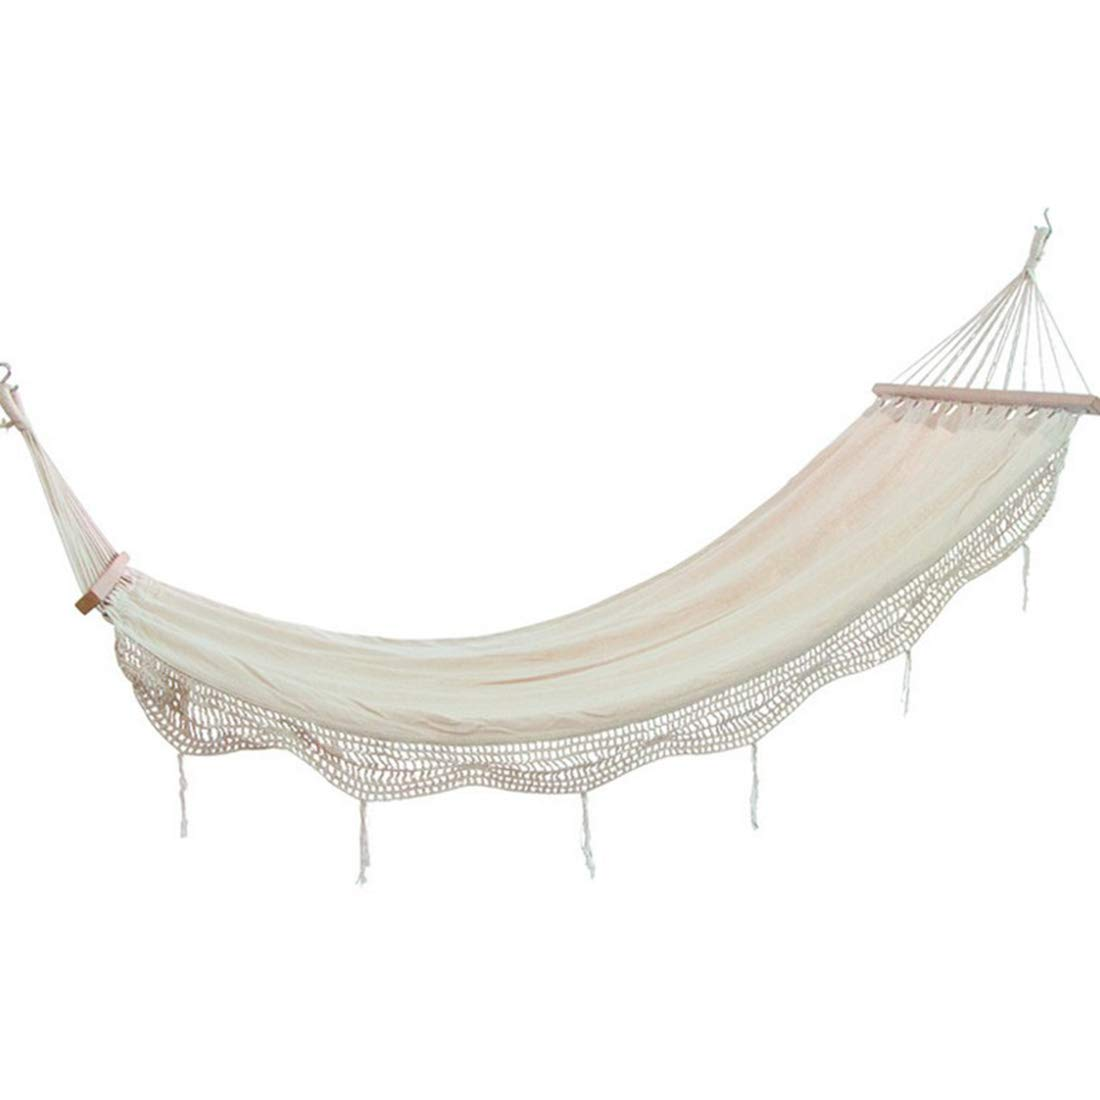 UICICI Multifunktions-Outdoor-Freizeitspitze Camping Sling Bett (Größe (Größe Bett   200cm) 0d7cee